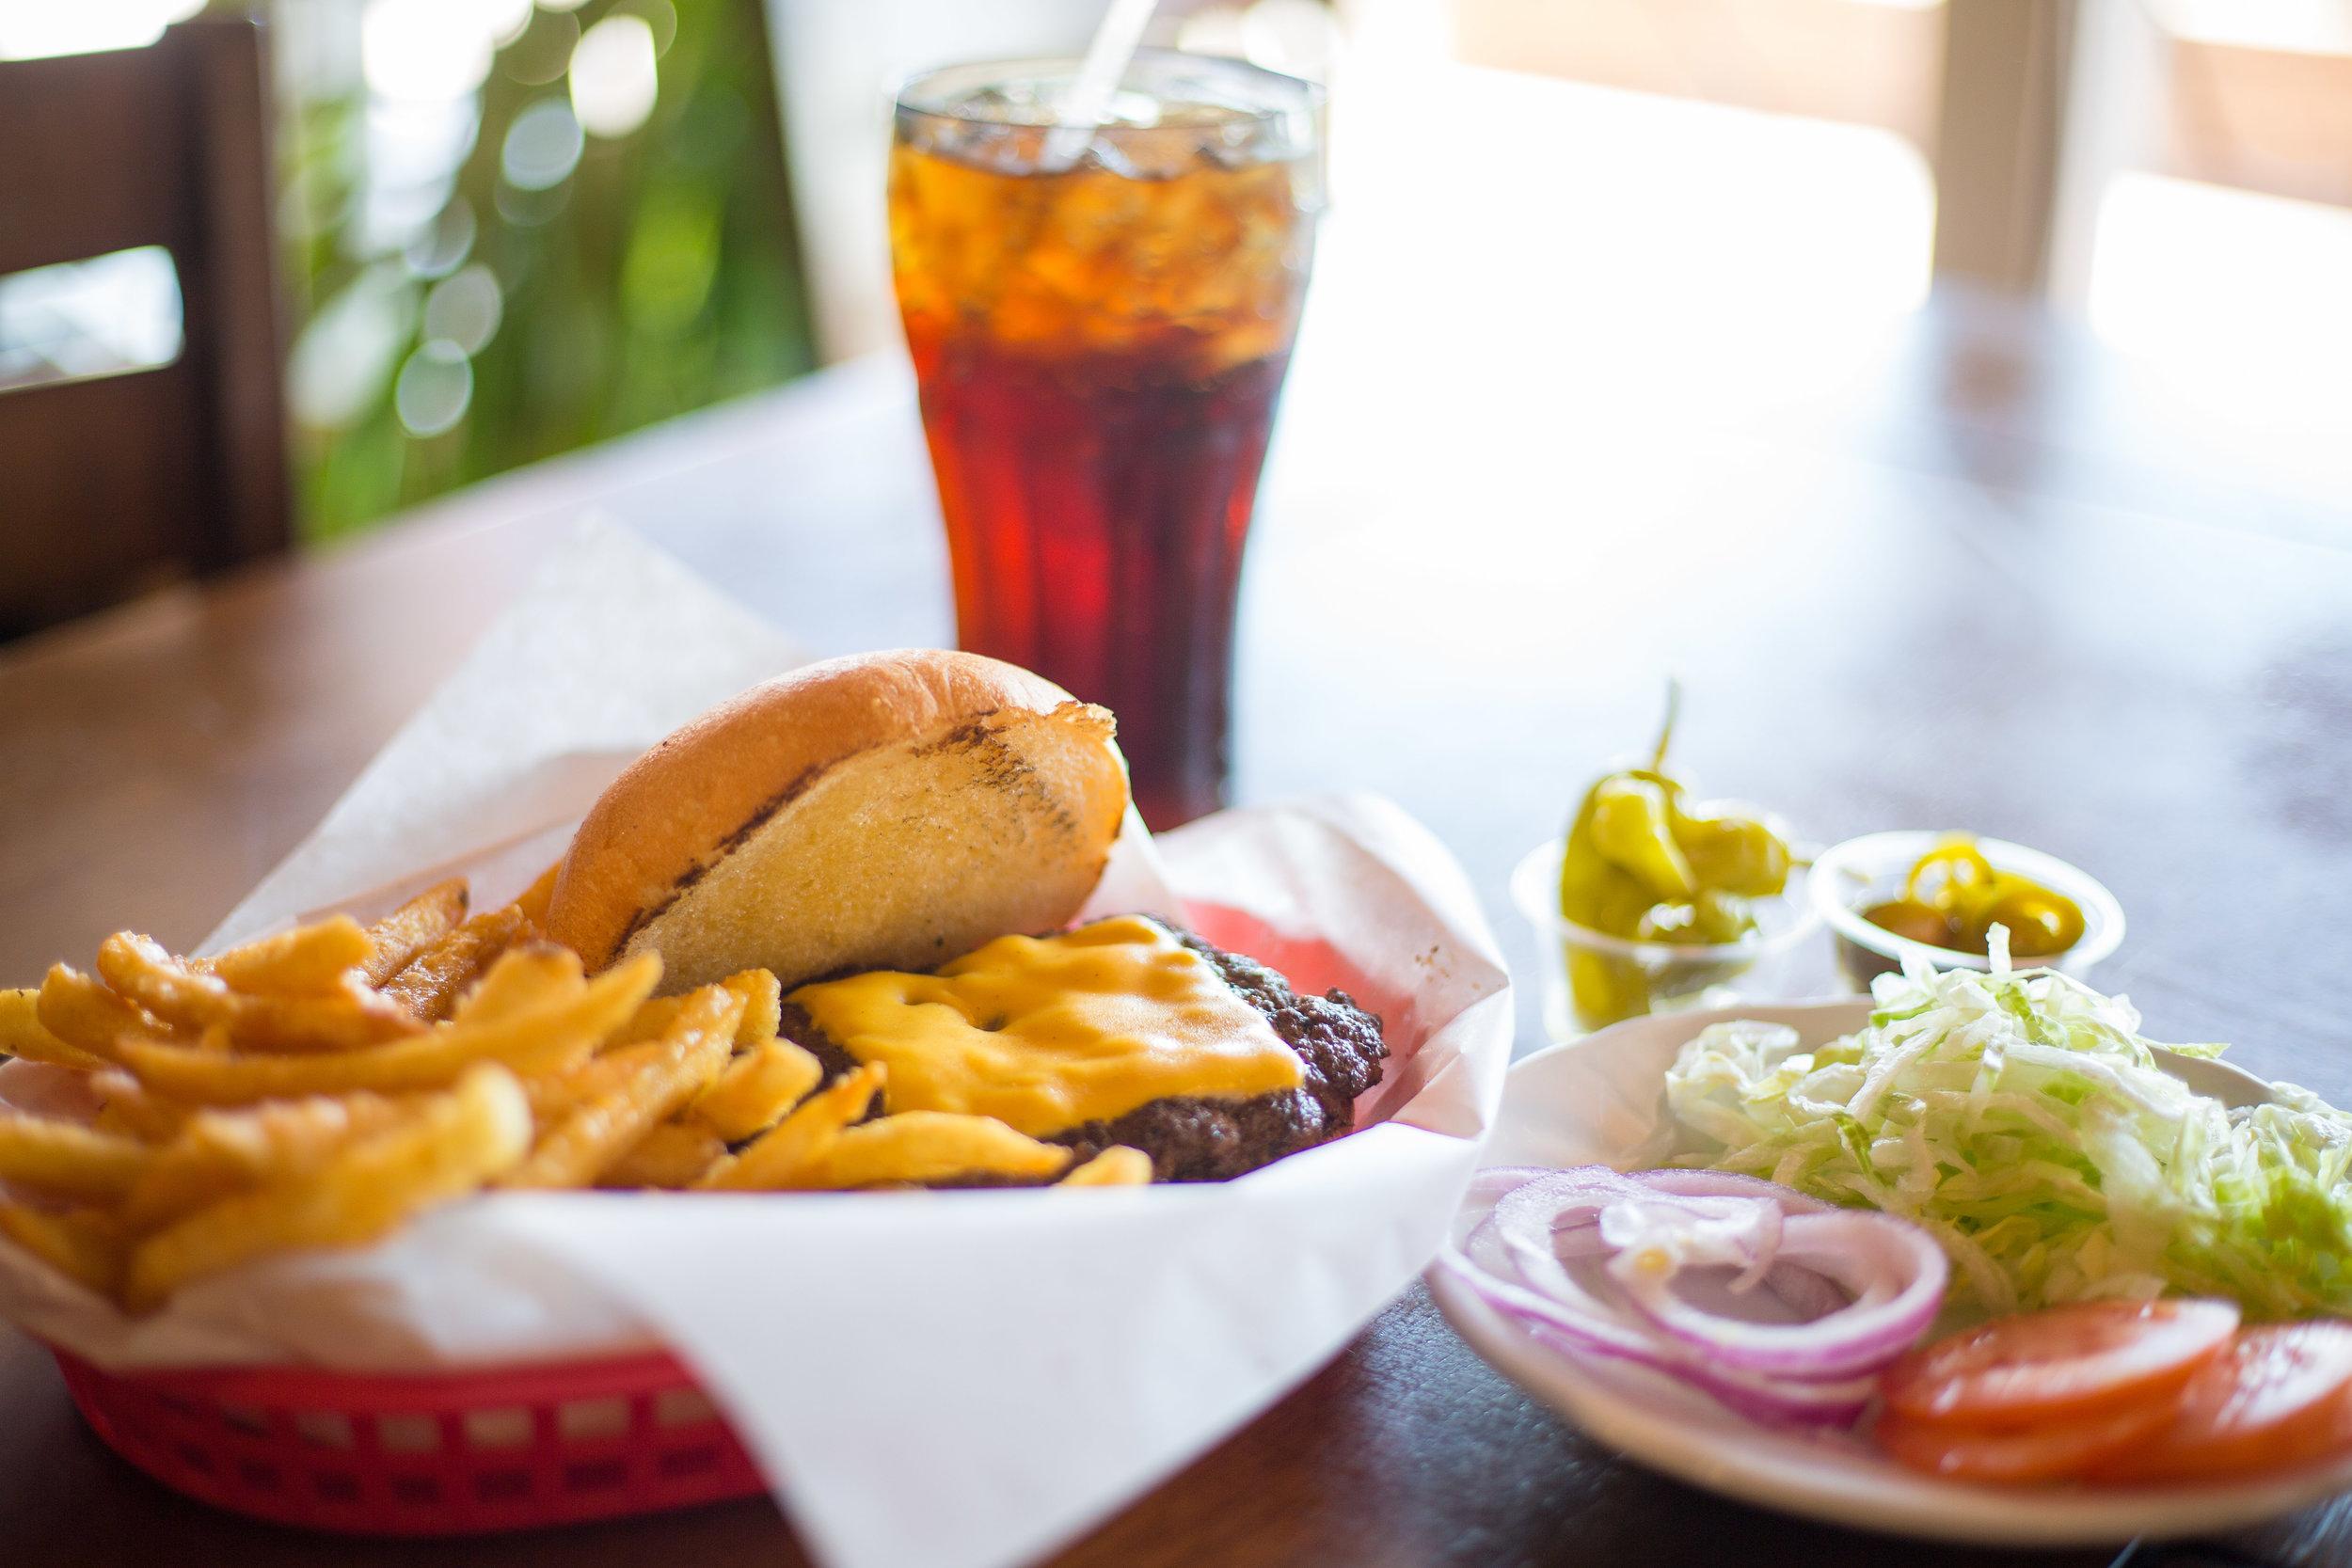 Carmona's BBQ and Deli   1040 E Lake Ave  Watsonville, CA 95076 P. (831) 761-9160  Follow on: Facebook & Instagram